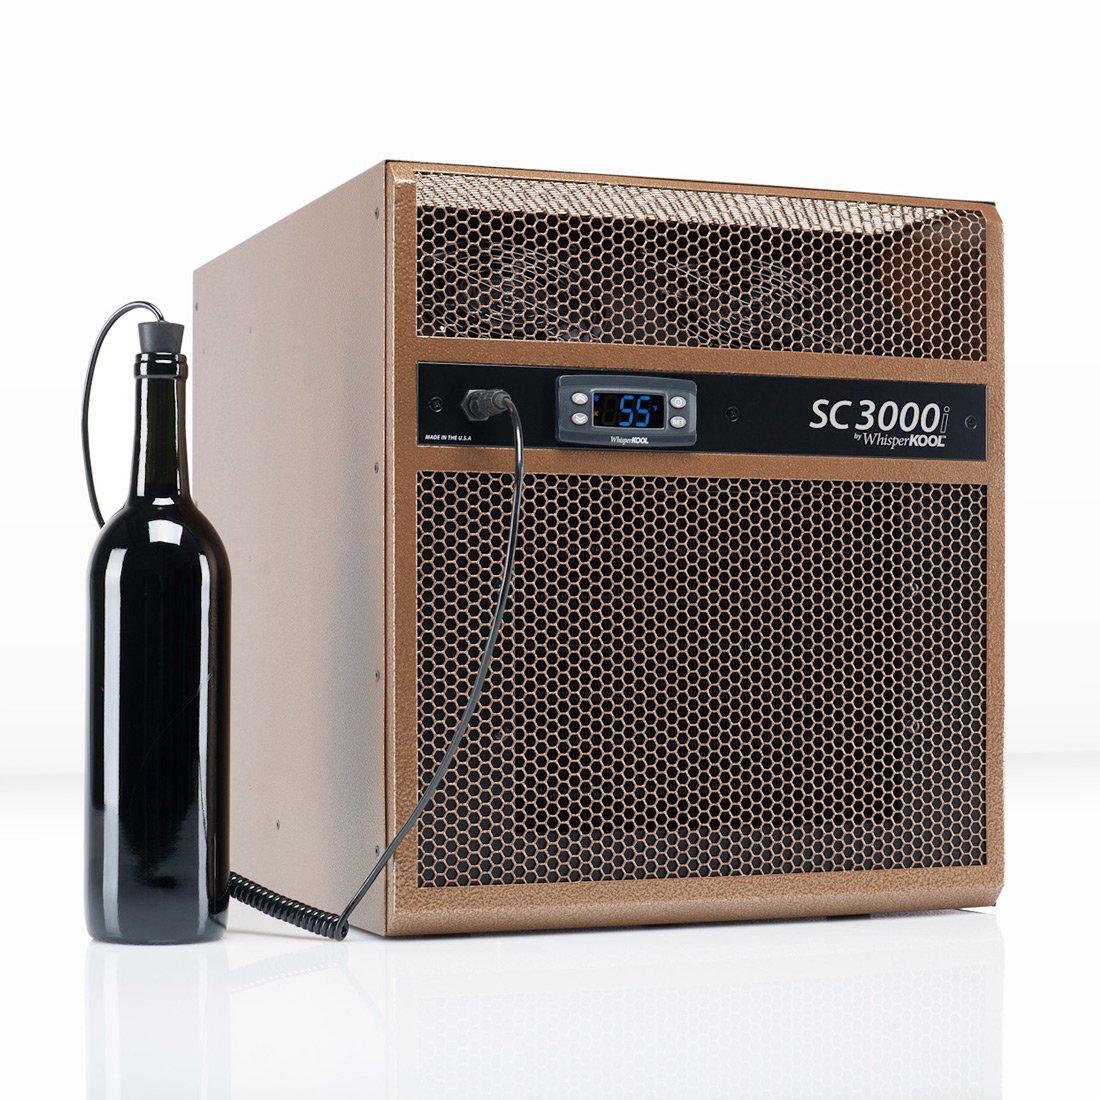 WhisperKOOL 3000i Wine Cooling Unit, 7263 by WhisperKOOL